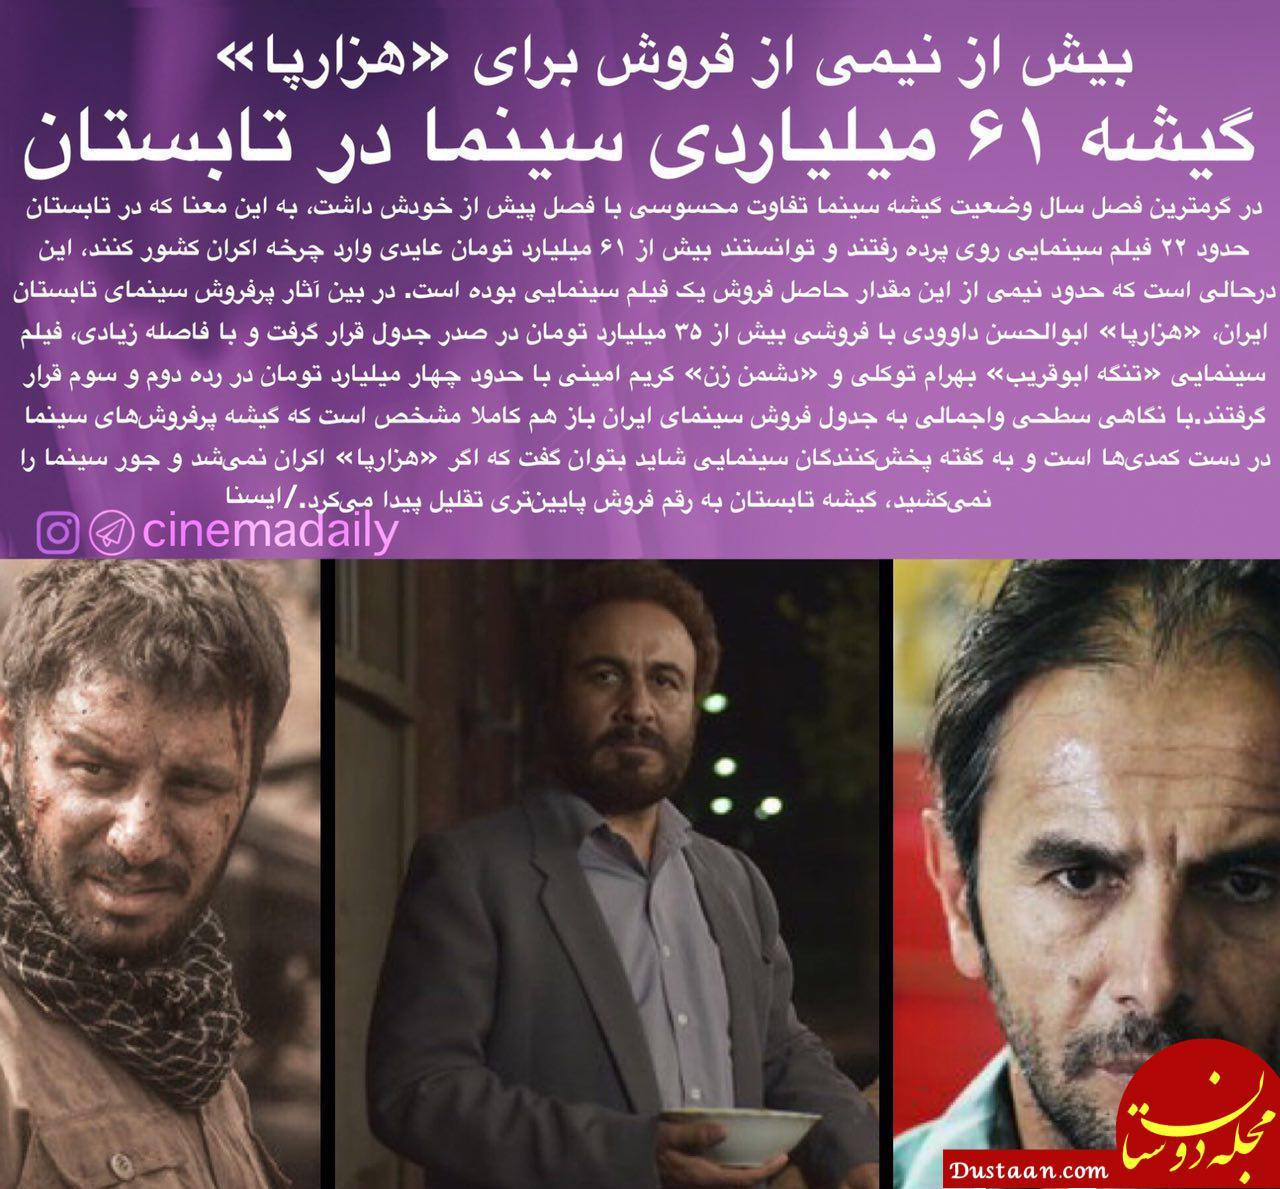 www.dustaan.com فروش 61 میلیاردی سینما در تابستان +عکس